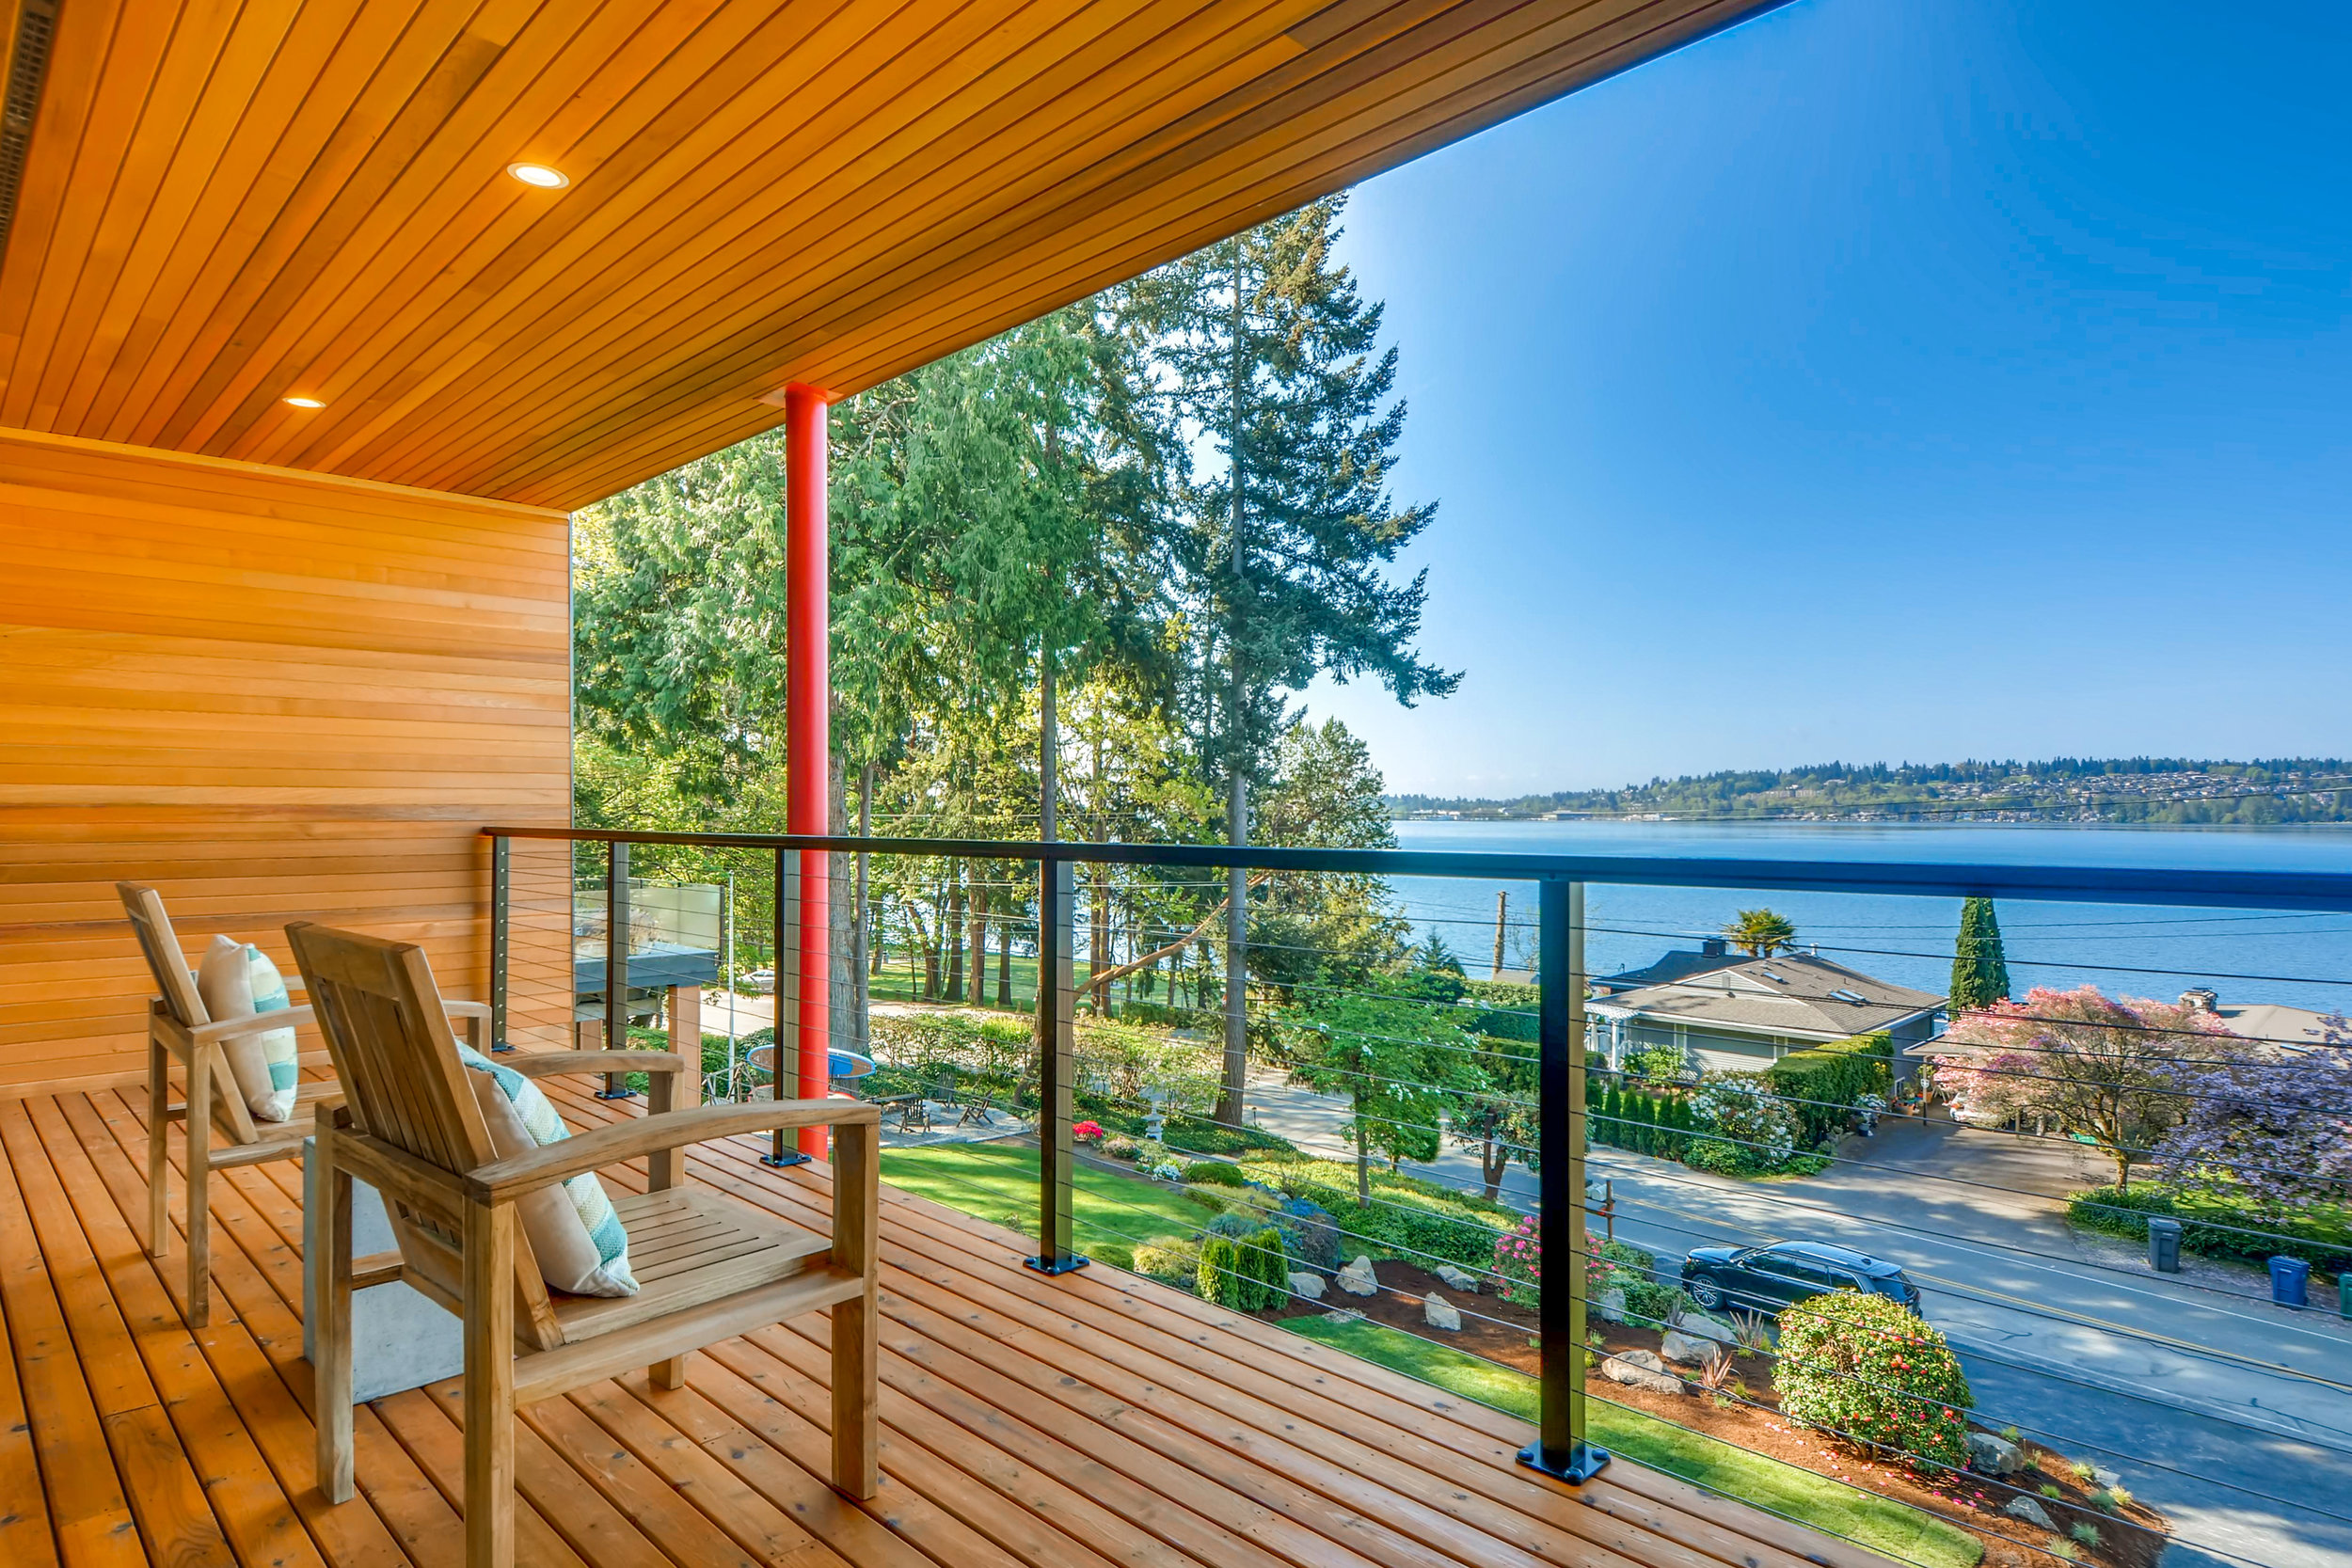 12410 Holmes Point Drive NE-print-038-29-Master Bedroom Balcony-4200x2800-300dpi.jpg